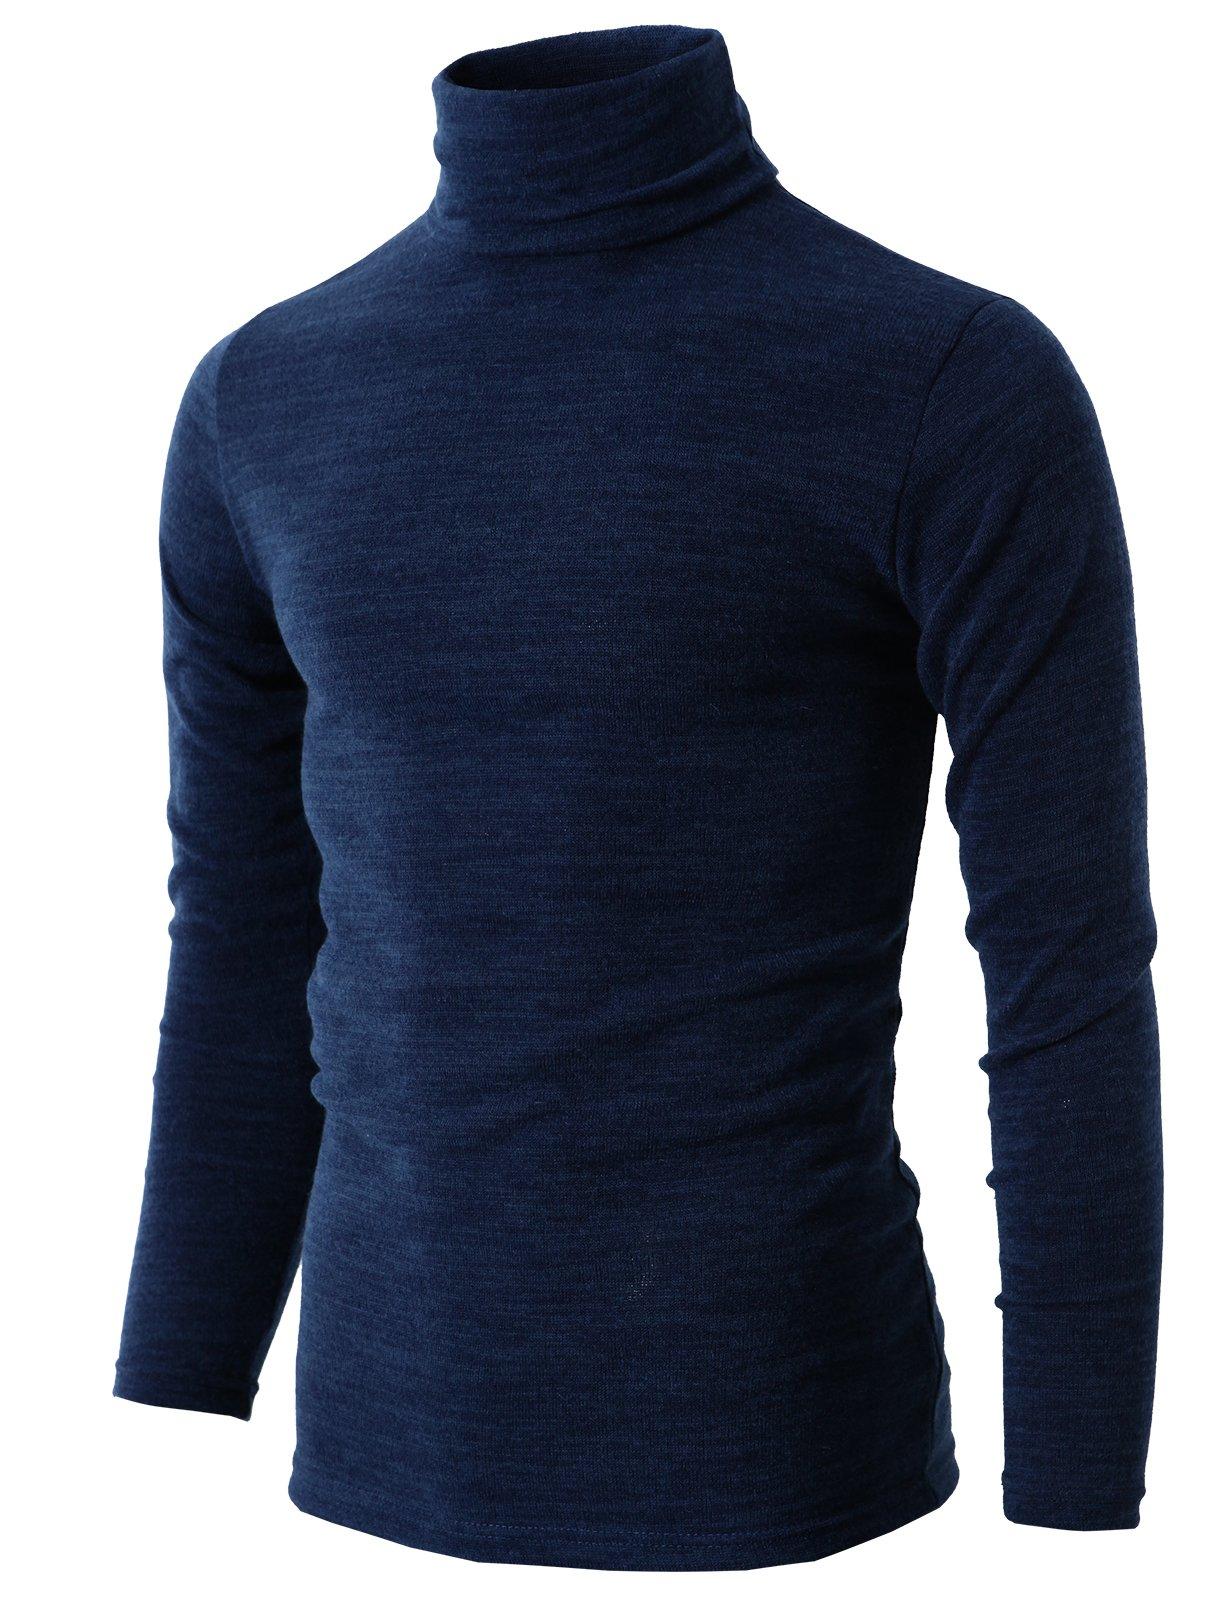 H2H Mens Lightweight Long Sleeve Rib Turtleneck Top Pullover Sweater NAVY US L/Asia 3XL (KMTTL028)